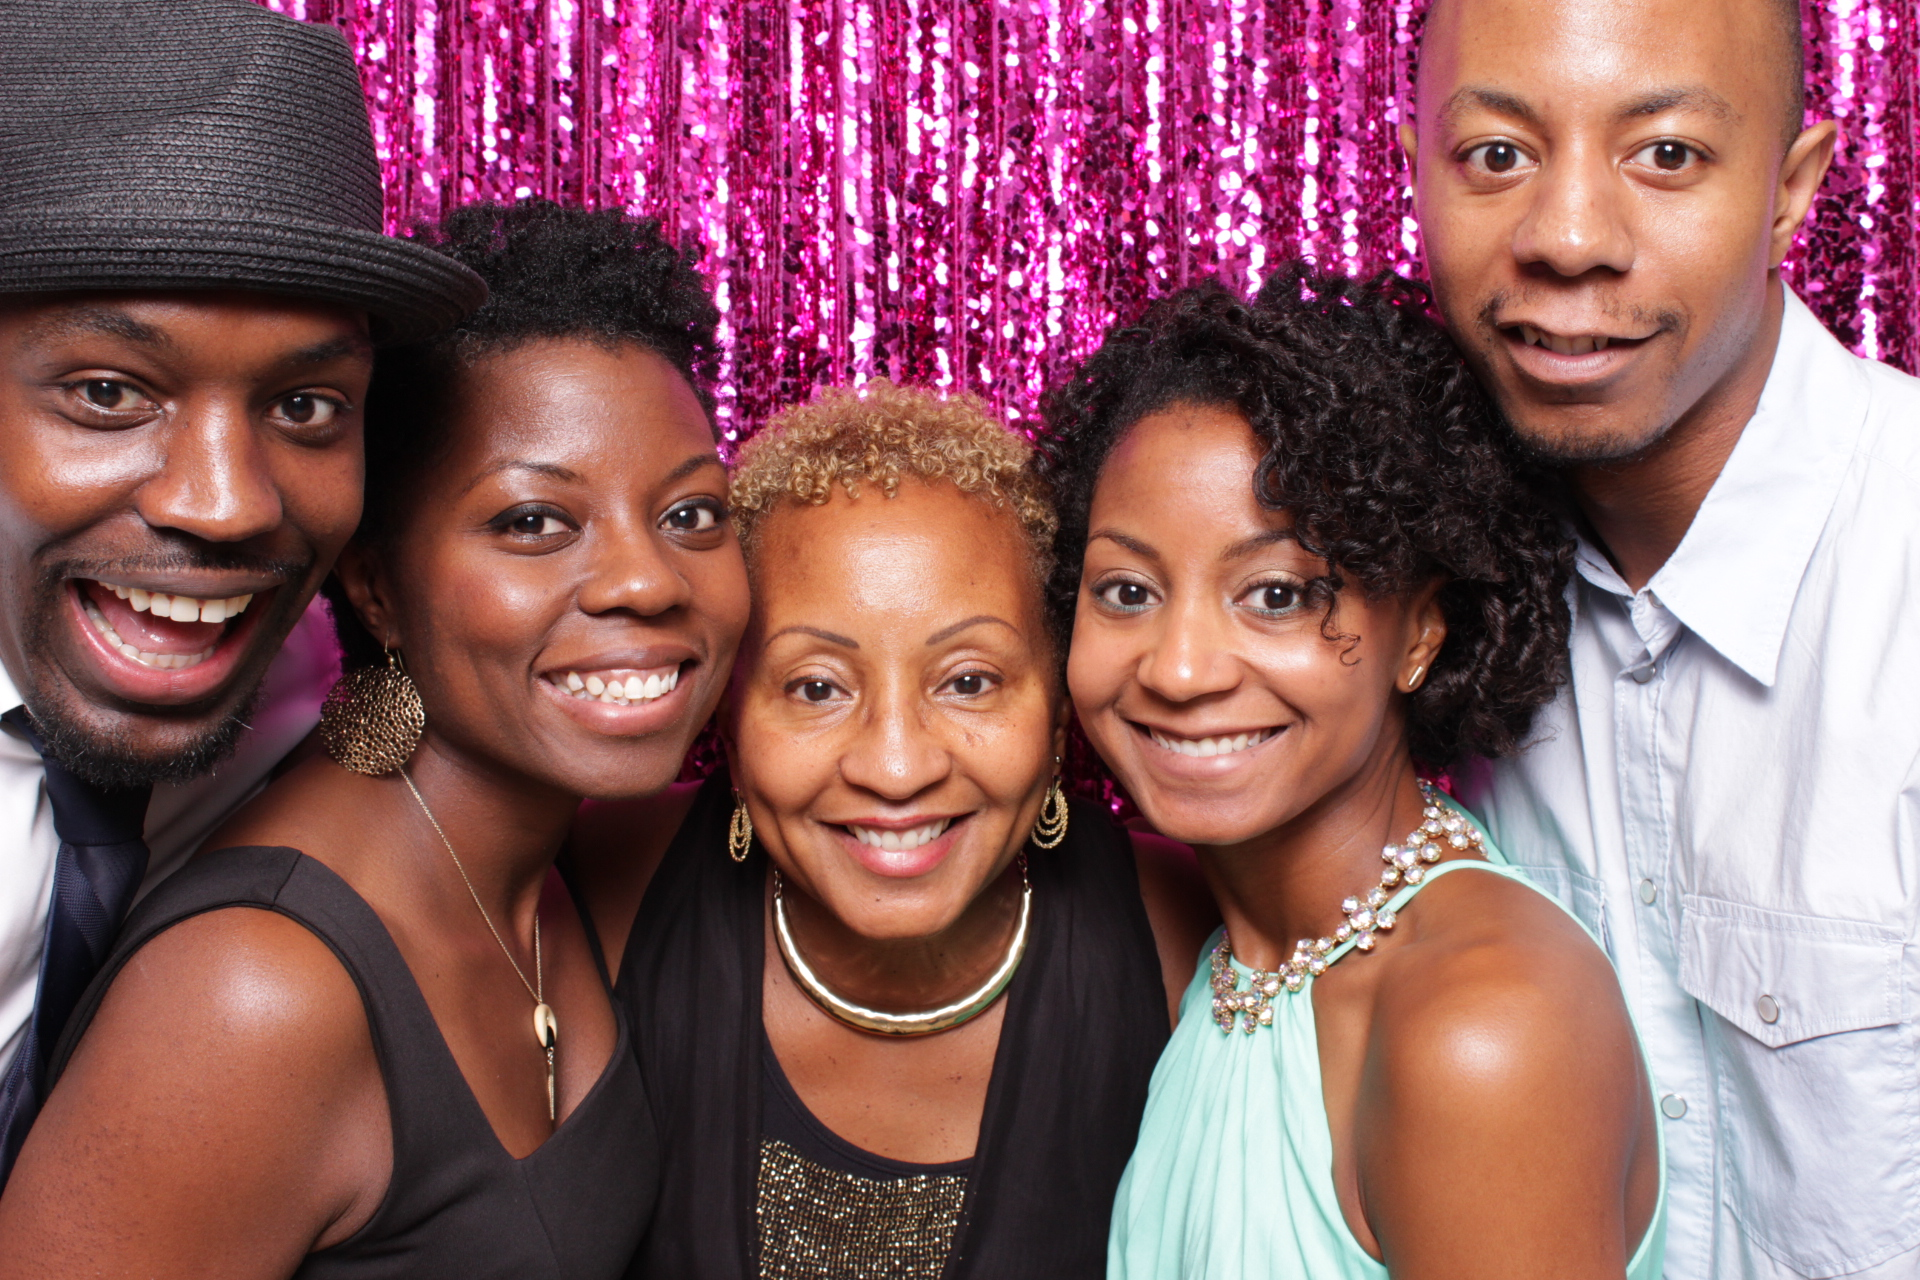 MYRA'S 60TH BIRTHDAY | HOT PINK PHOTO BOOTH